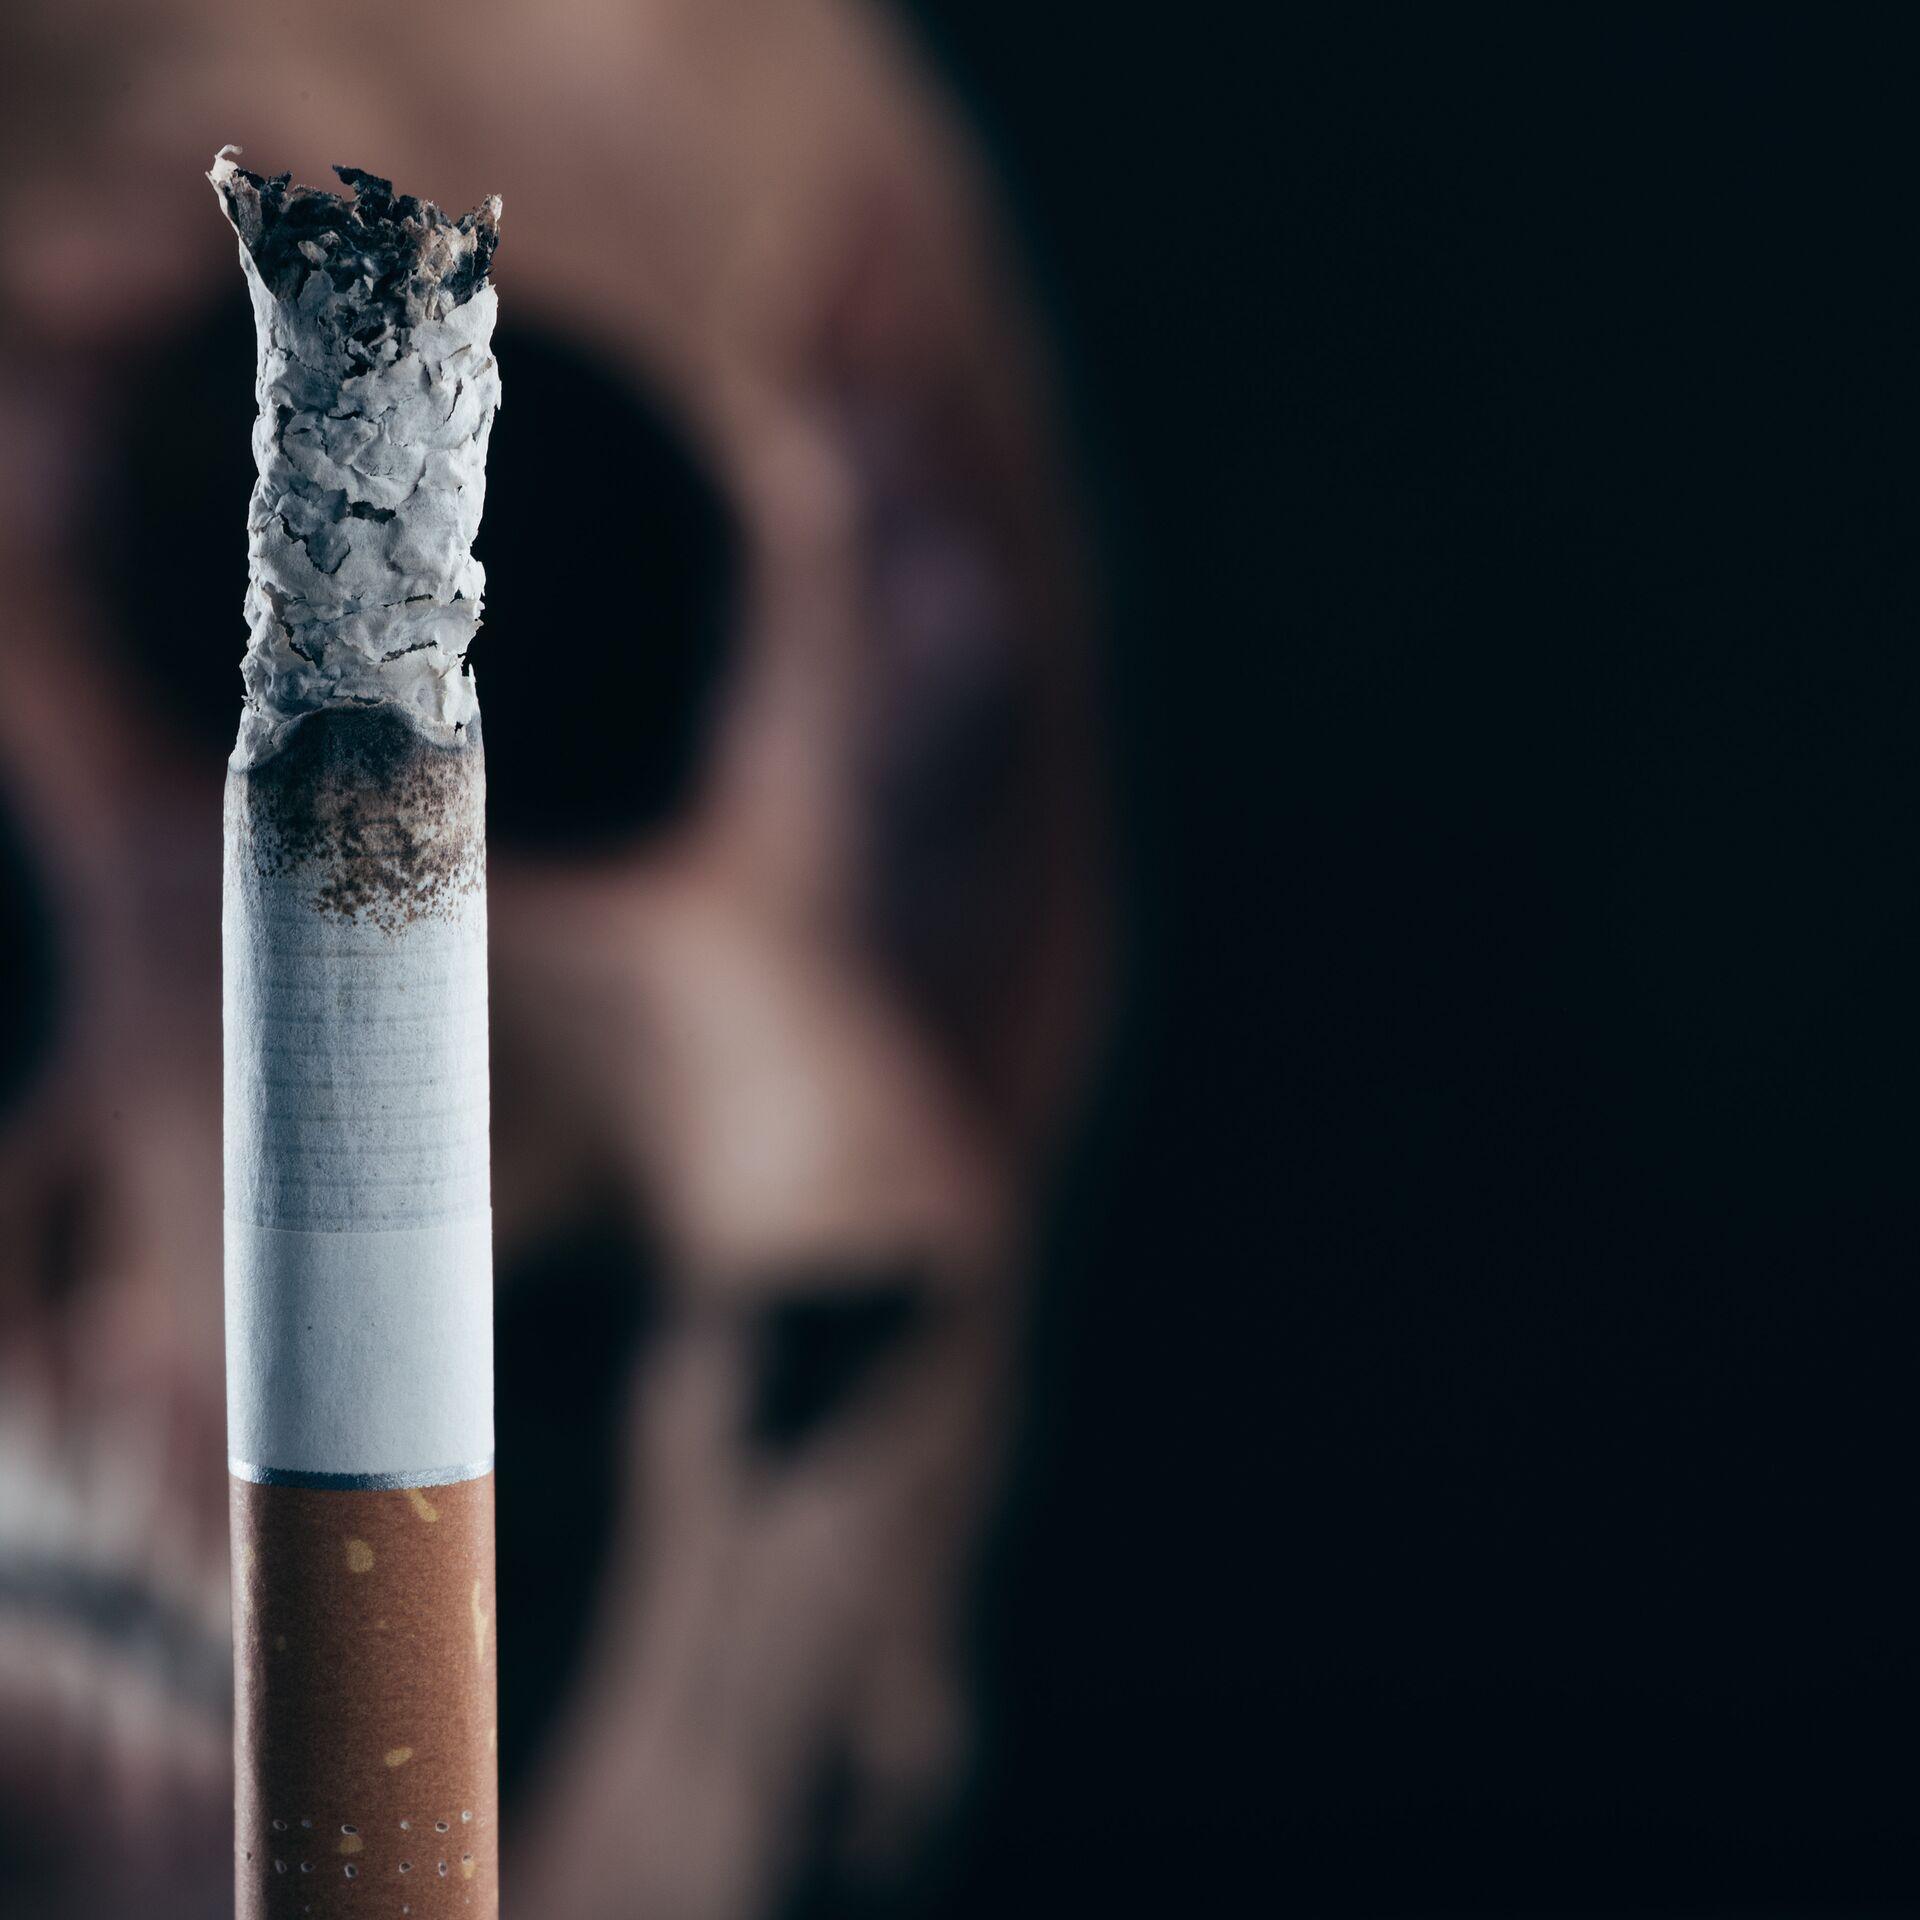 сигарет онлайн 1 нет